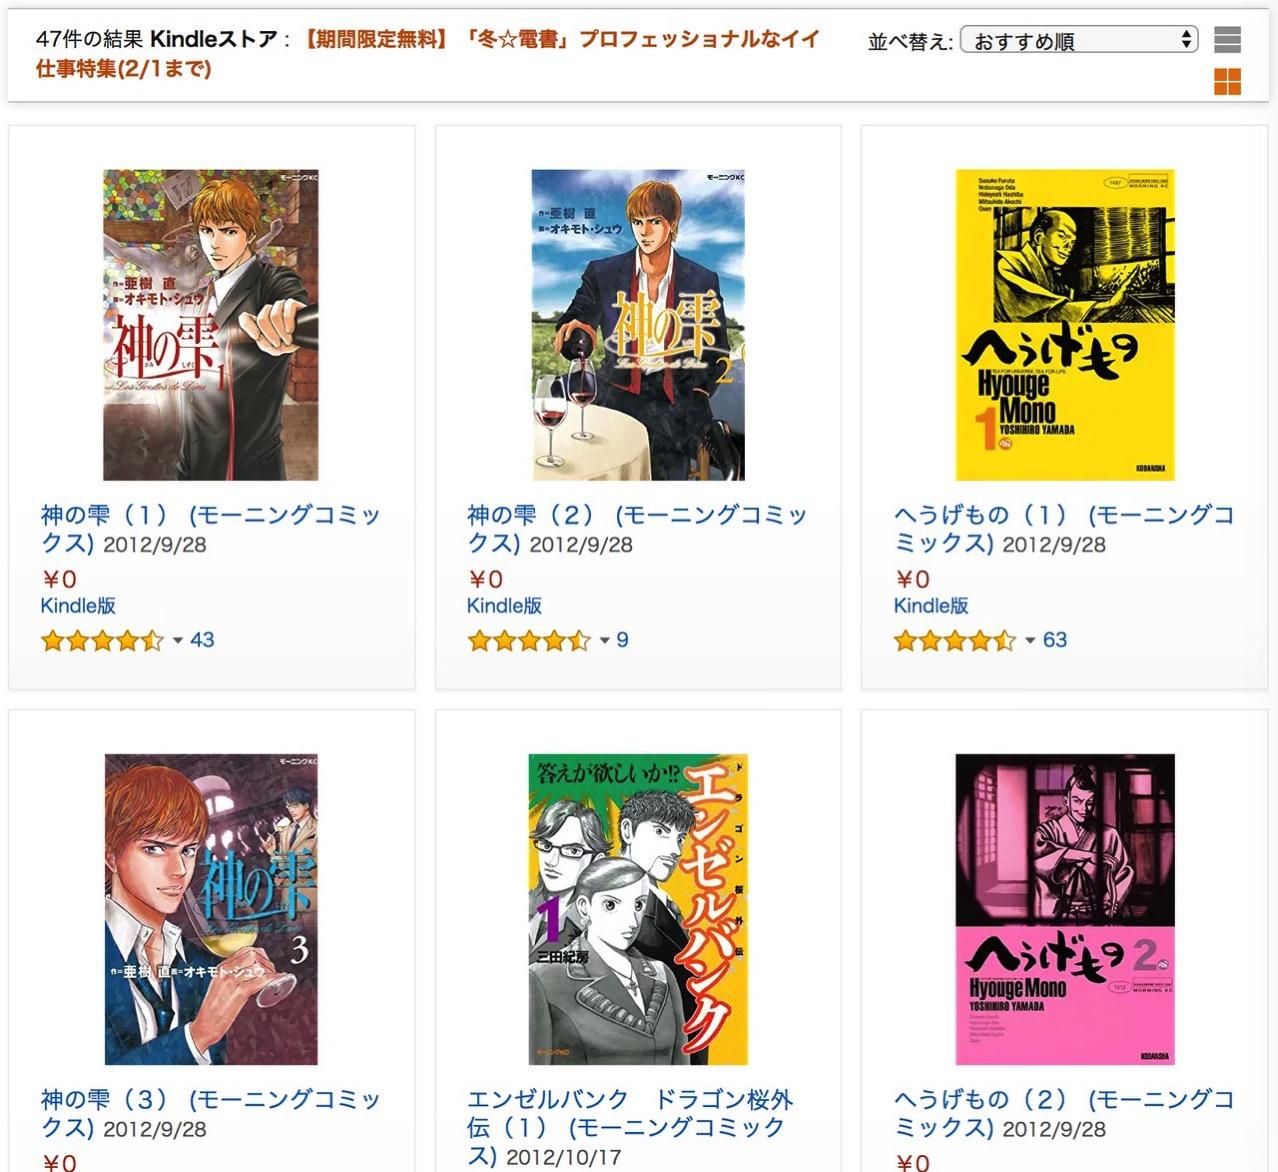 【Kindleセール】期間限定無料「冬☆電書」プロフェッショナルなイイ仕事特集(2/1まで)